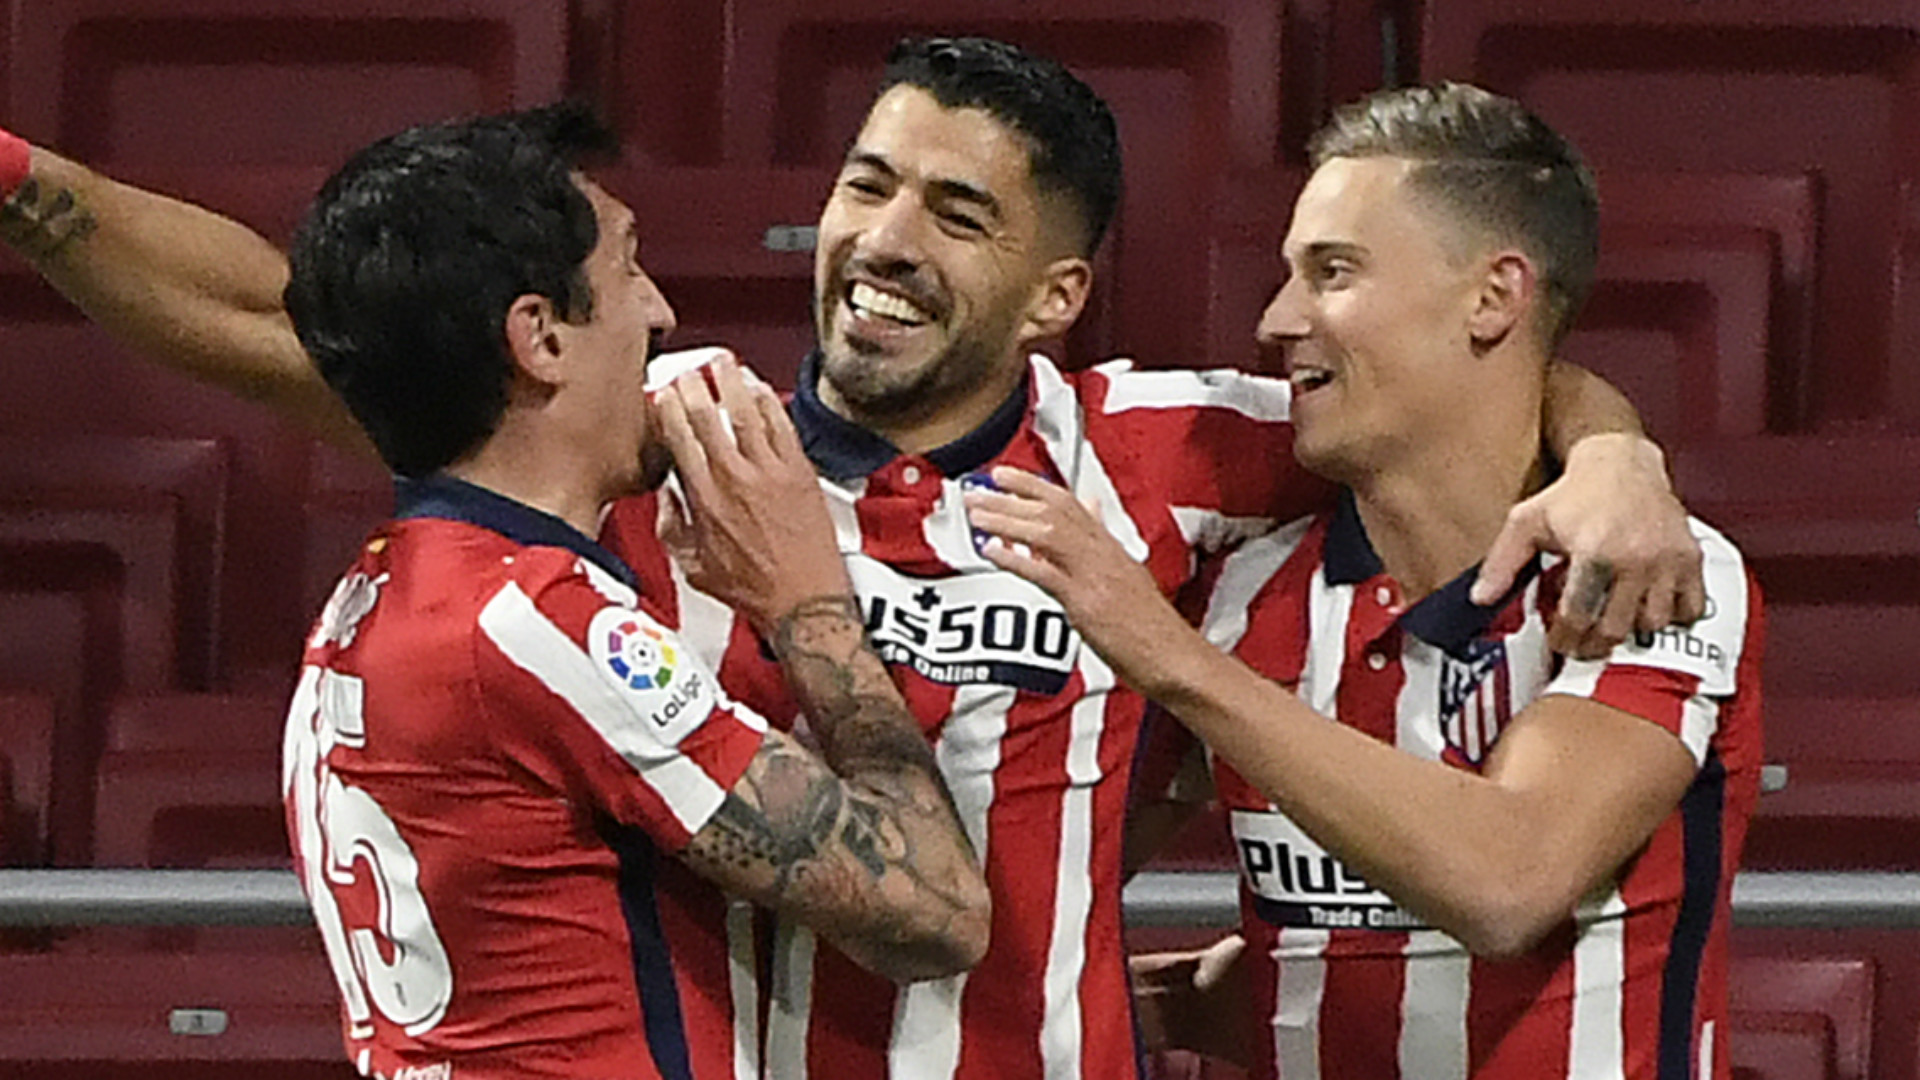 Suarez matches Falcao scoring record with Atletico Madrid strike to continue superb start at Wanda Metropolitano